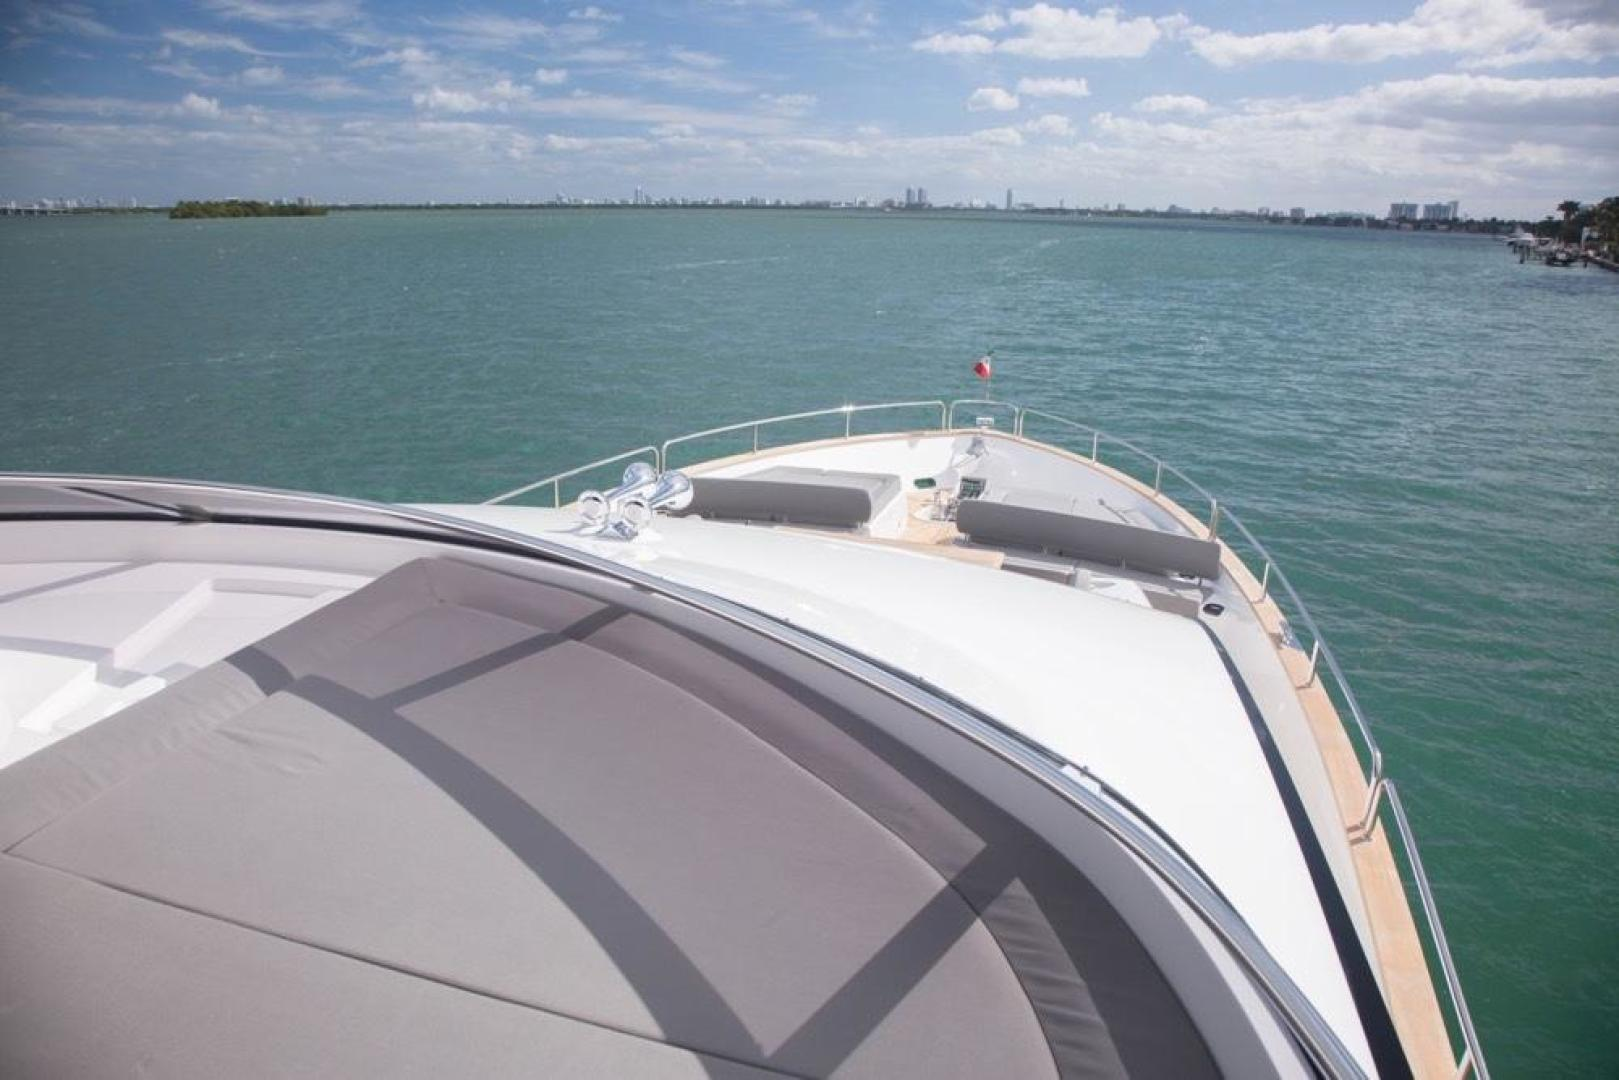 Sunseeker-28 Metre Yacht 2016-RIII Miami-Florida-United States-600087 | Thumbnail